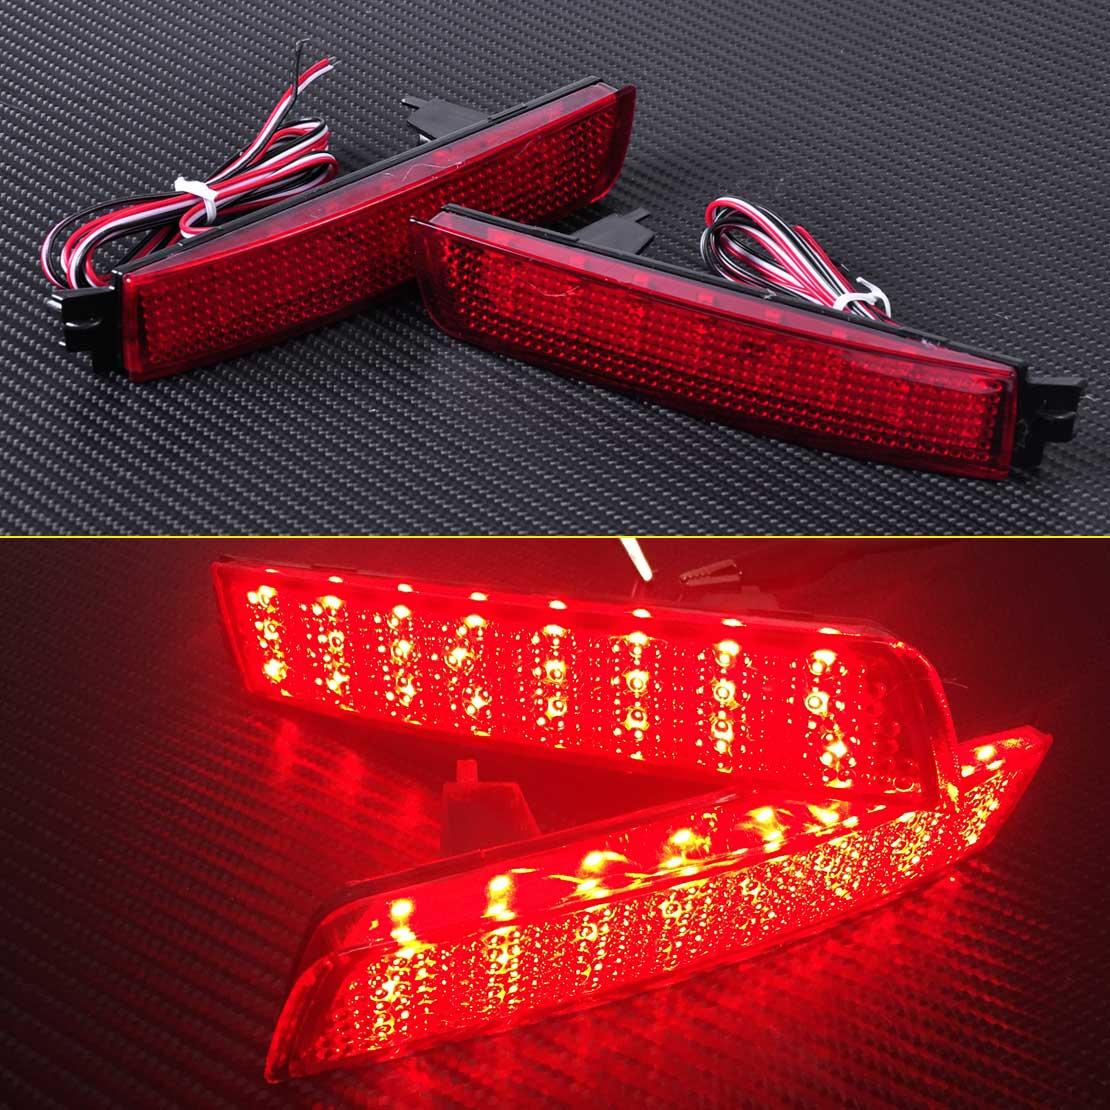 New Red Lens LED Bumper Reflector Rear Tail Brake Light 26565-5C000 Fit for Nissan Juke Quest Murano Sentra Infiniti FX35 FX37<br><br>Aliexpress